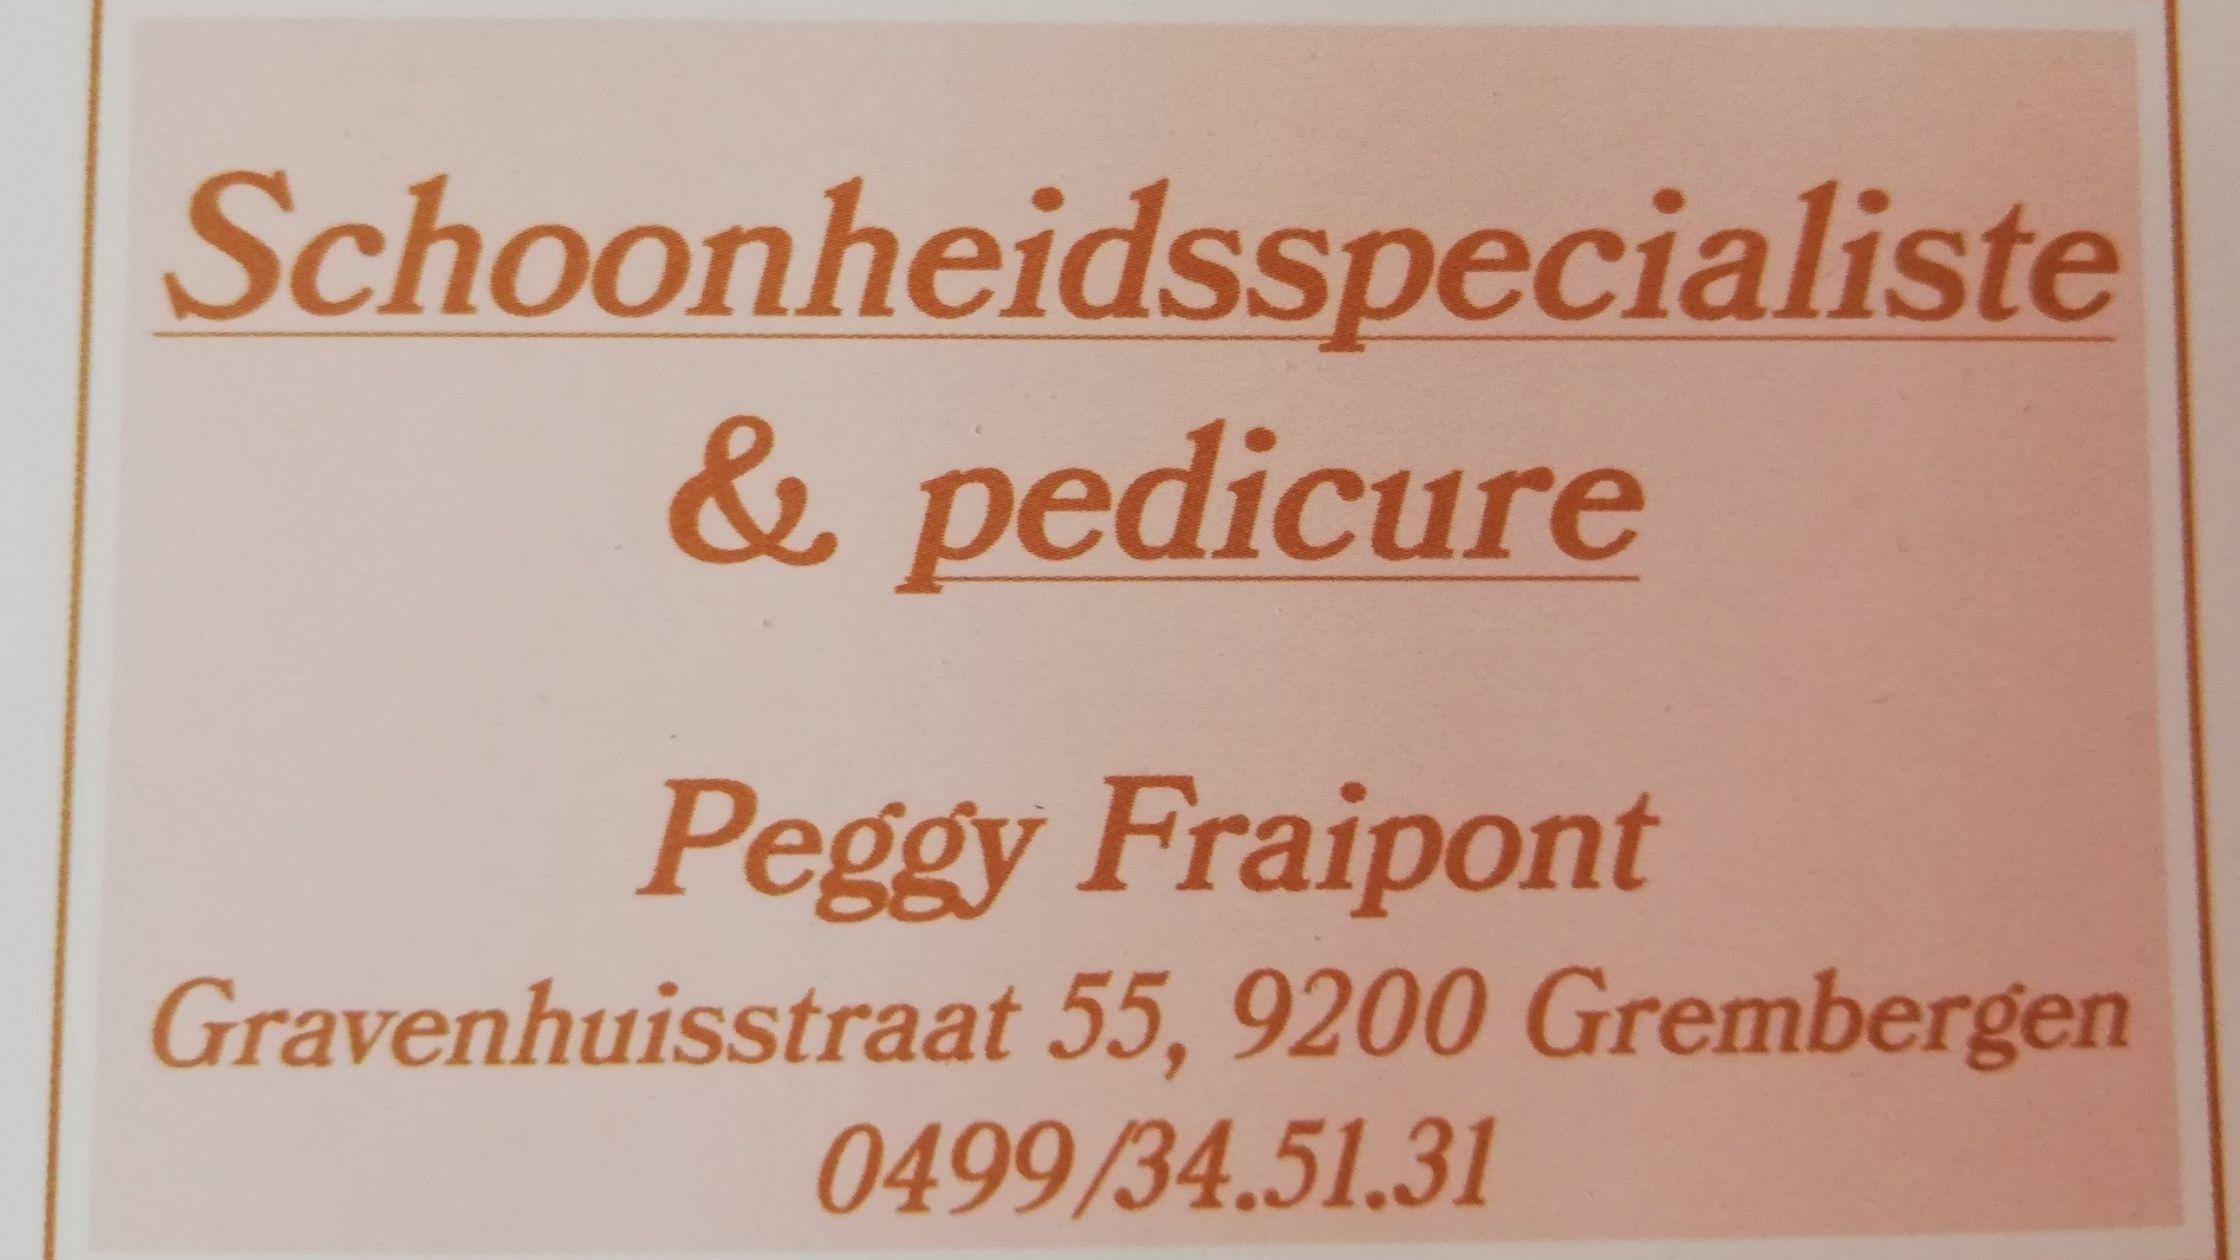 Peggy Fraipont